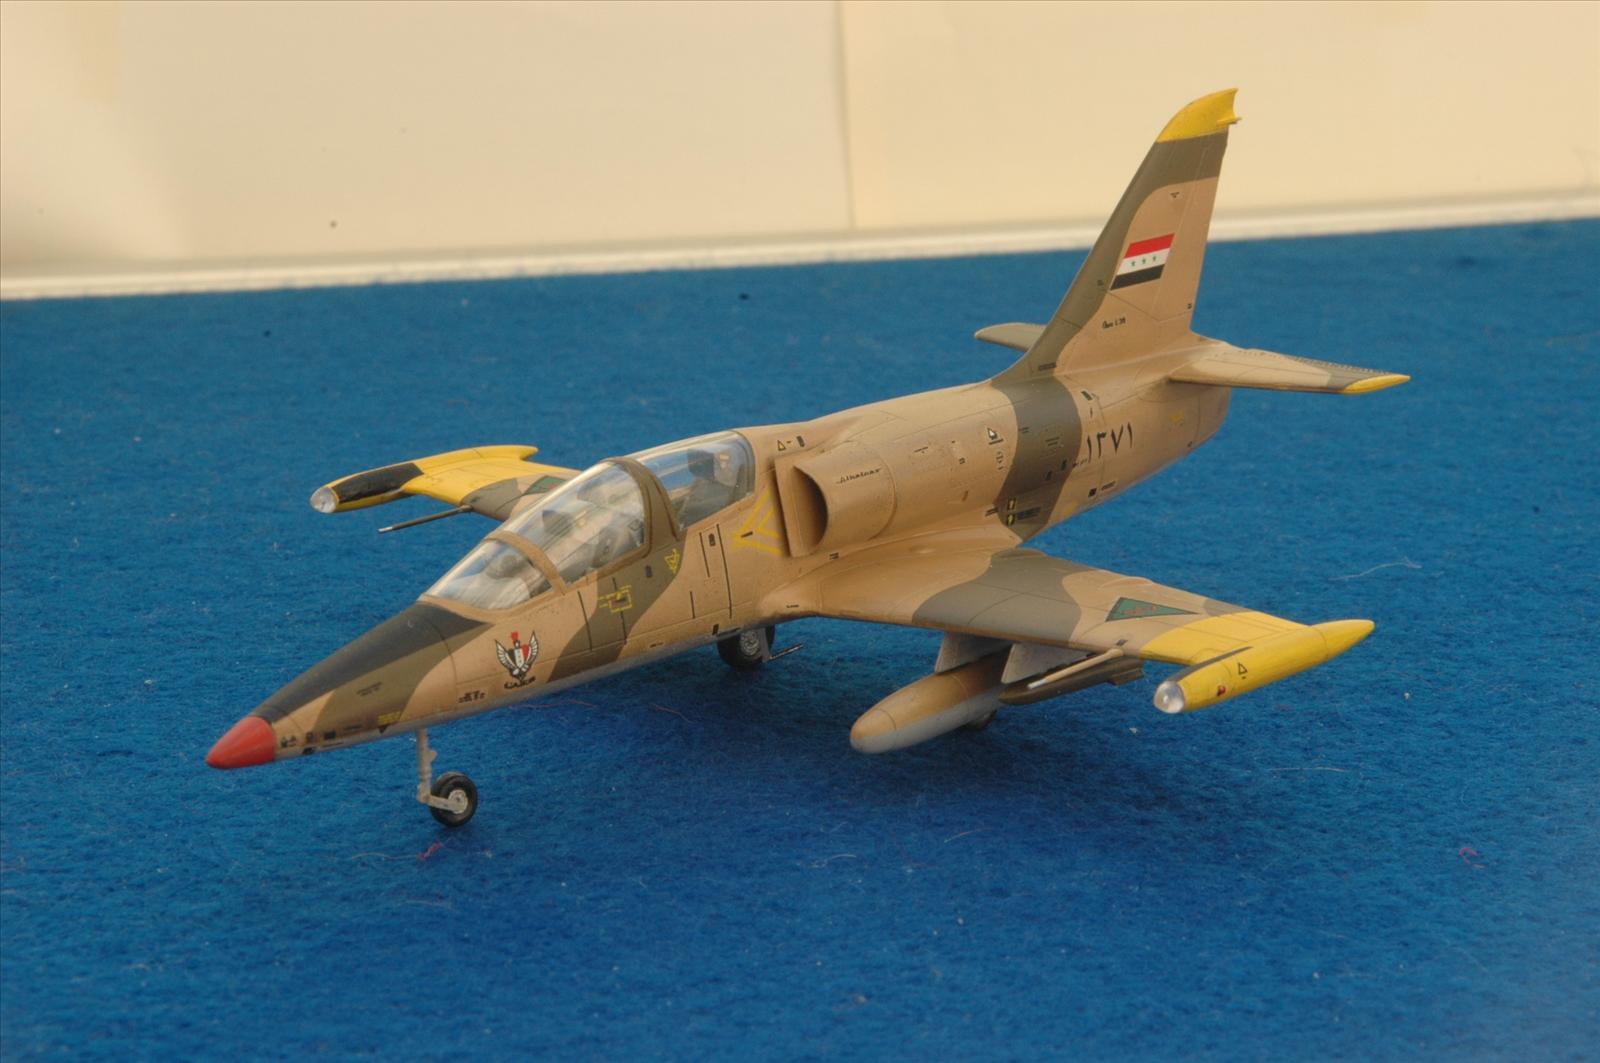 GB#8: Aero L-39 Albatros-Eduard 1/72